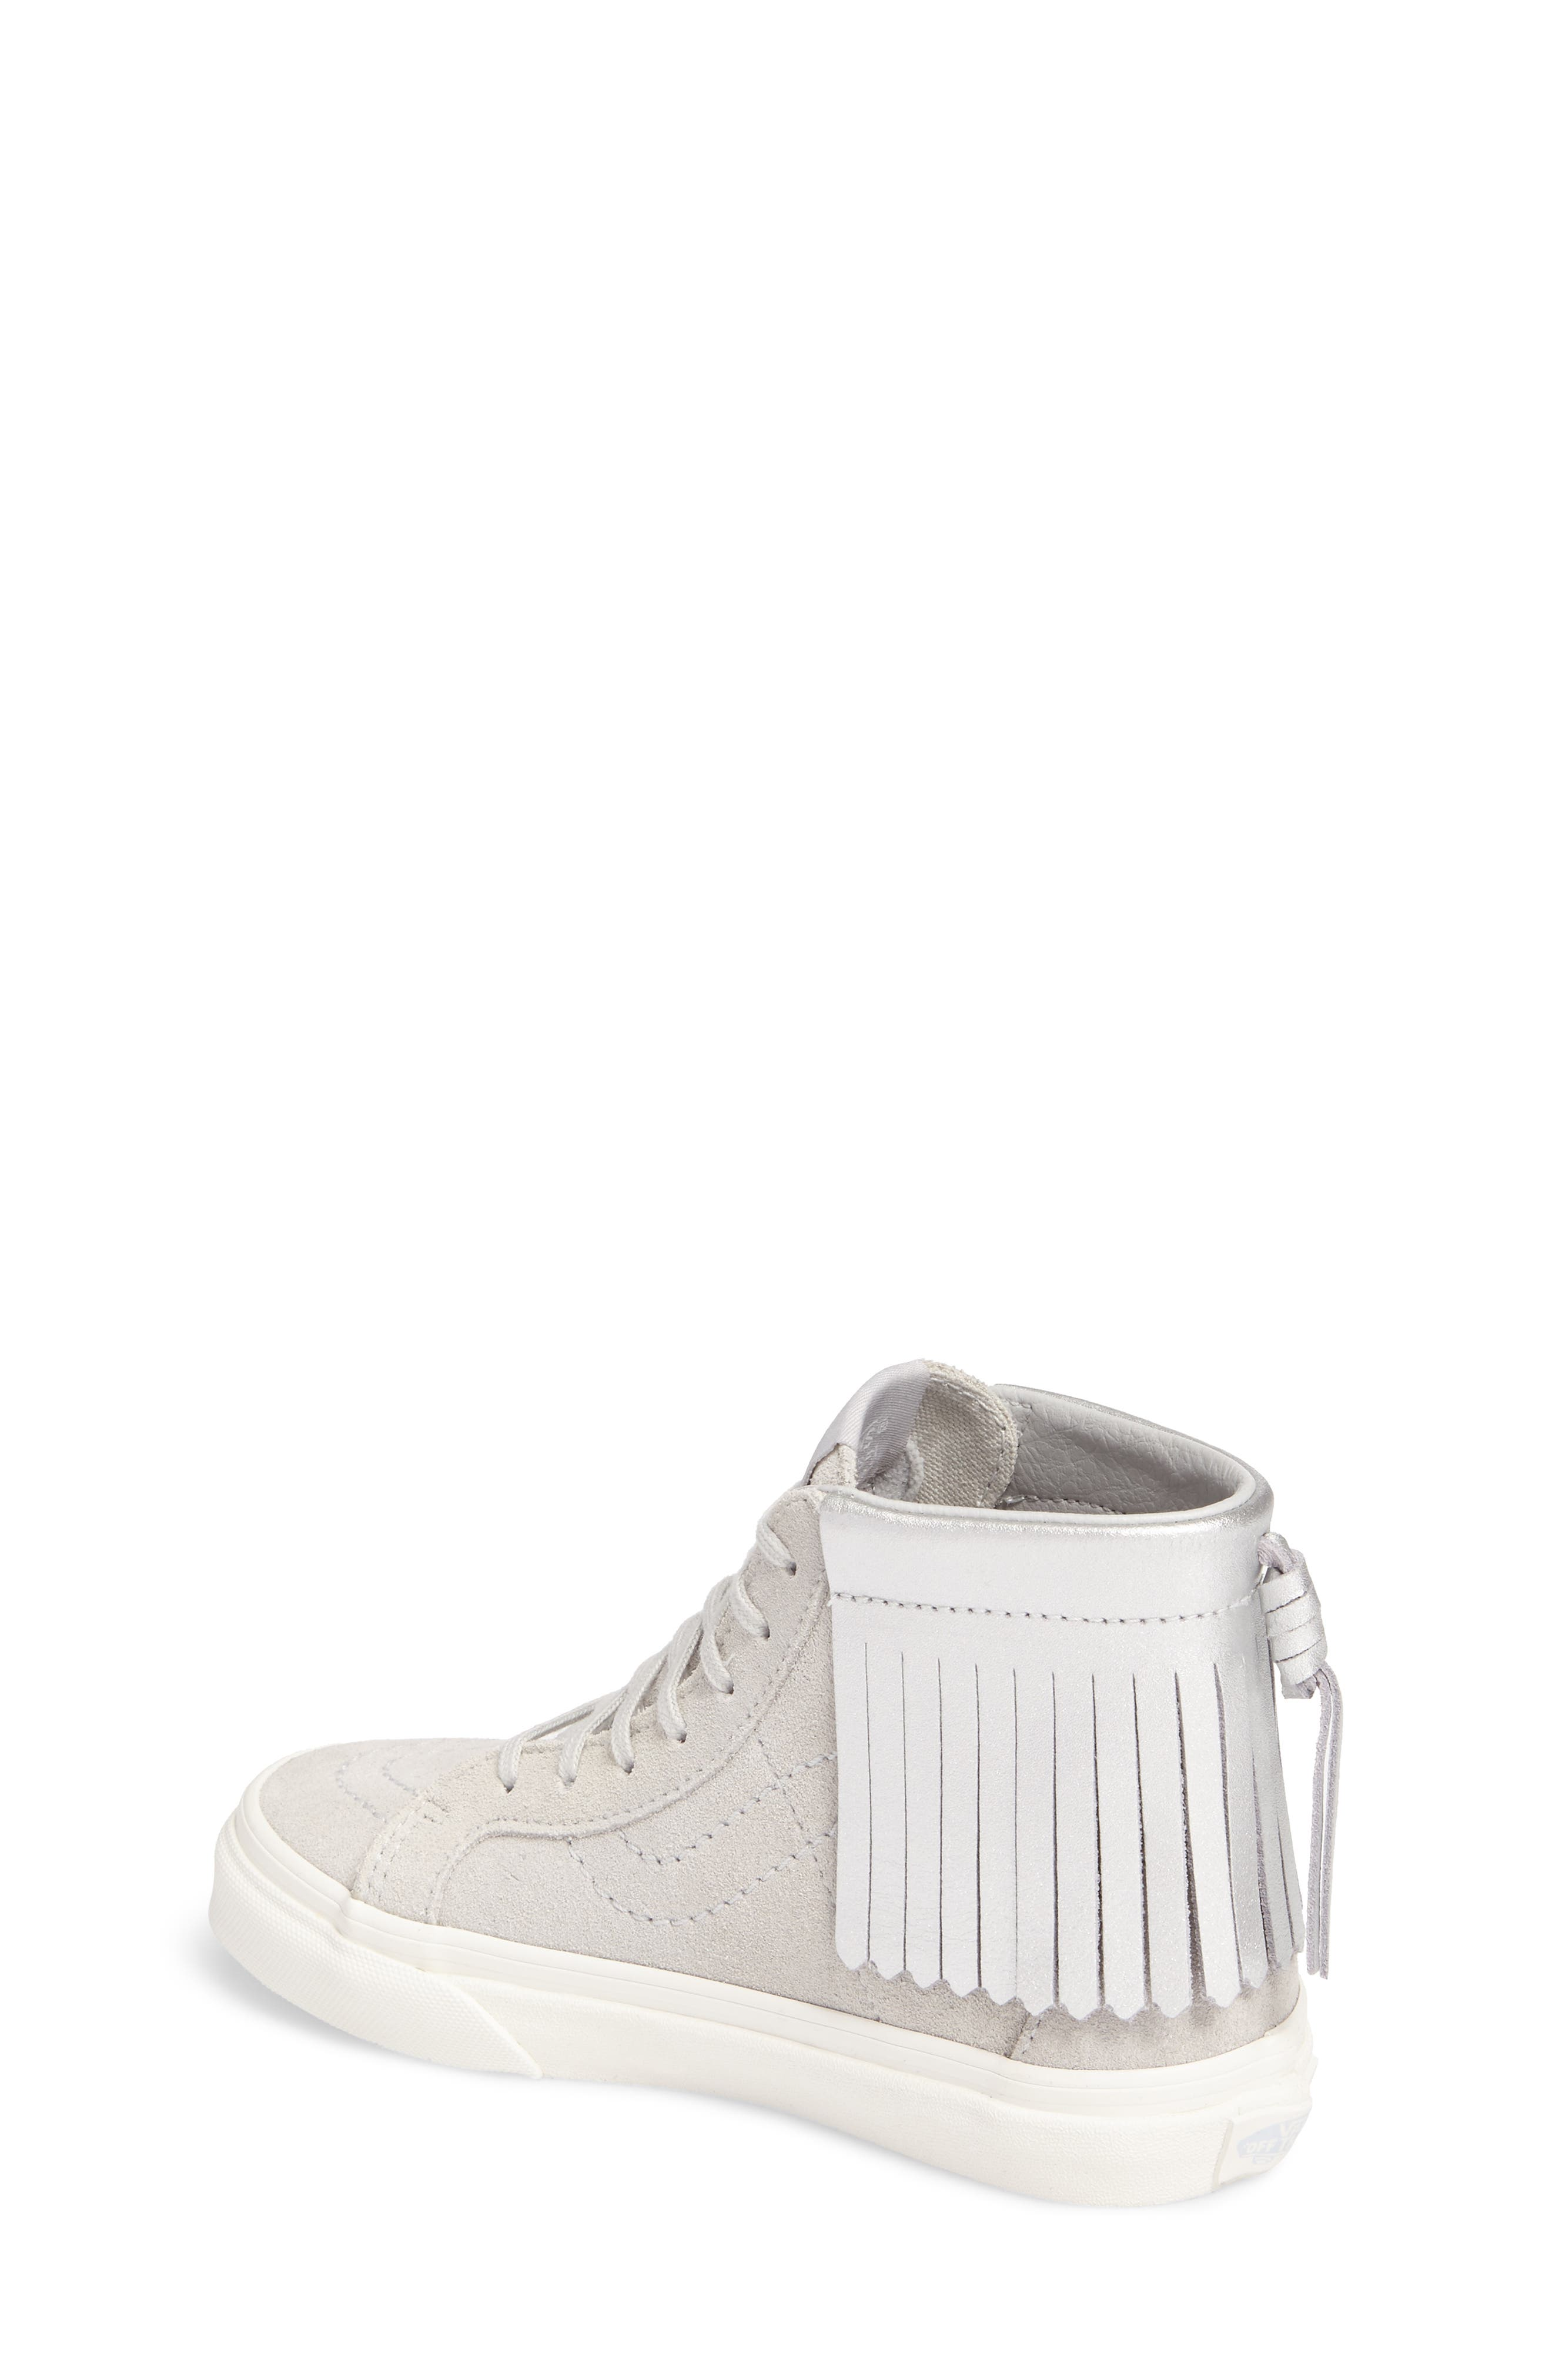 Sk8-Hi Moc Sneaker,                             Alternate thumbnail 2, color,                             Metallic Glacier Gray